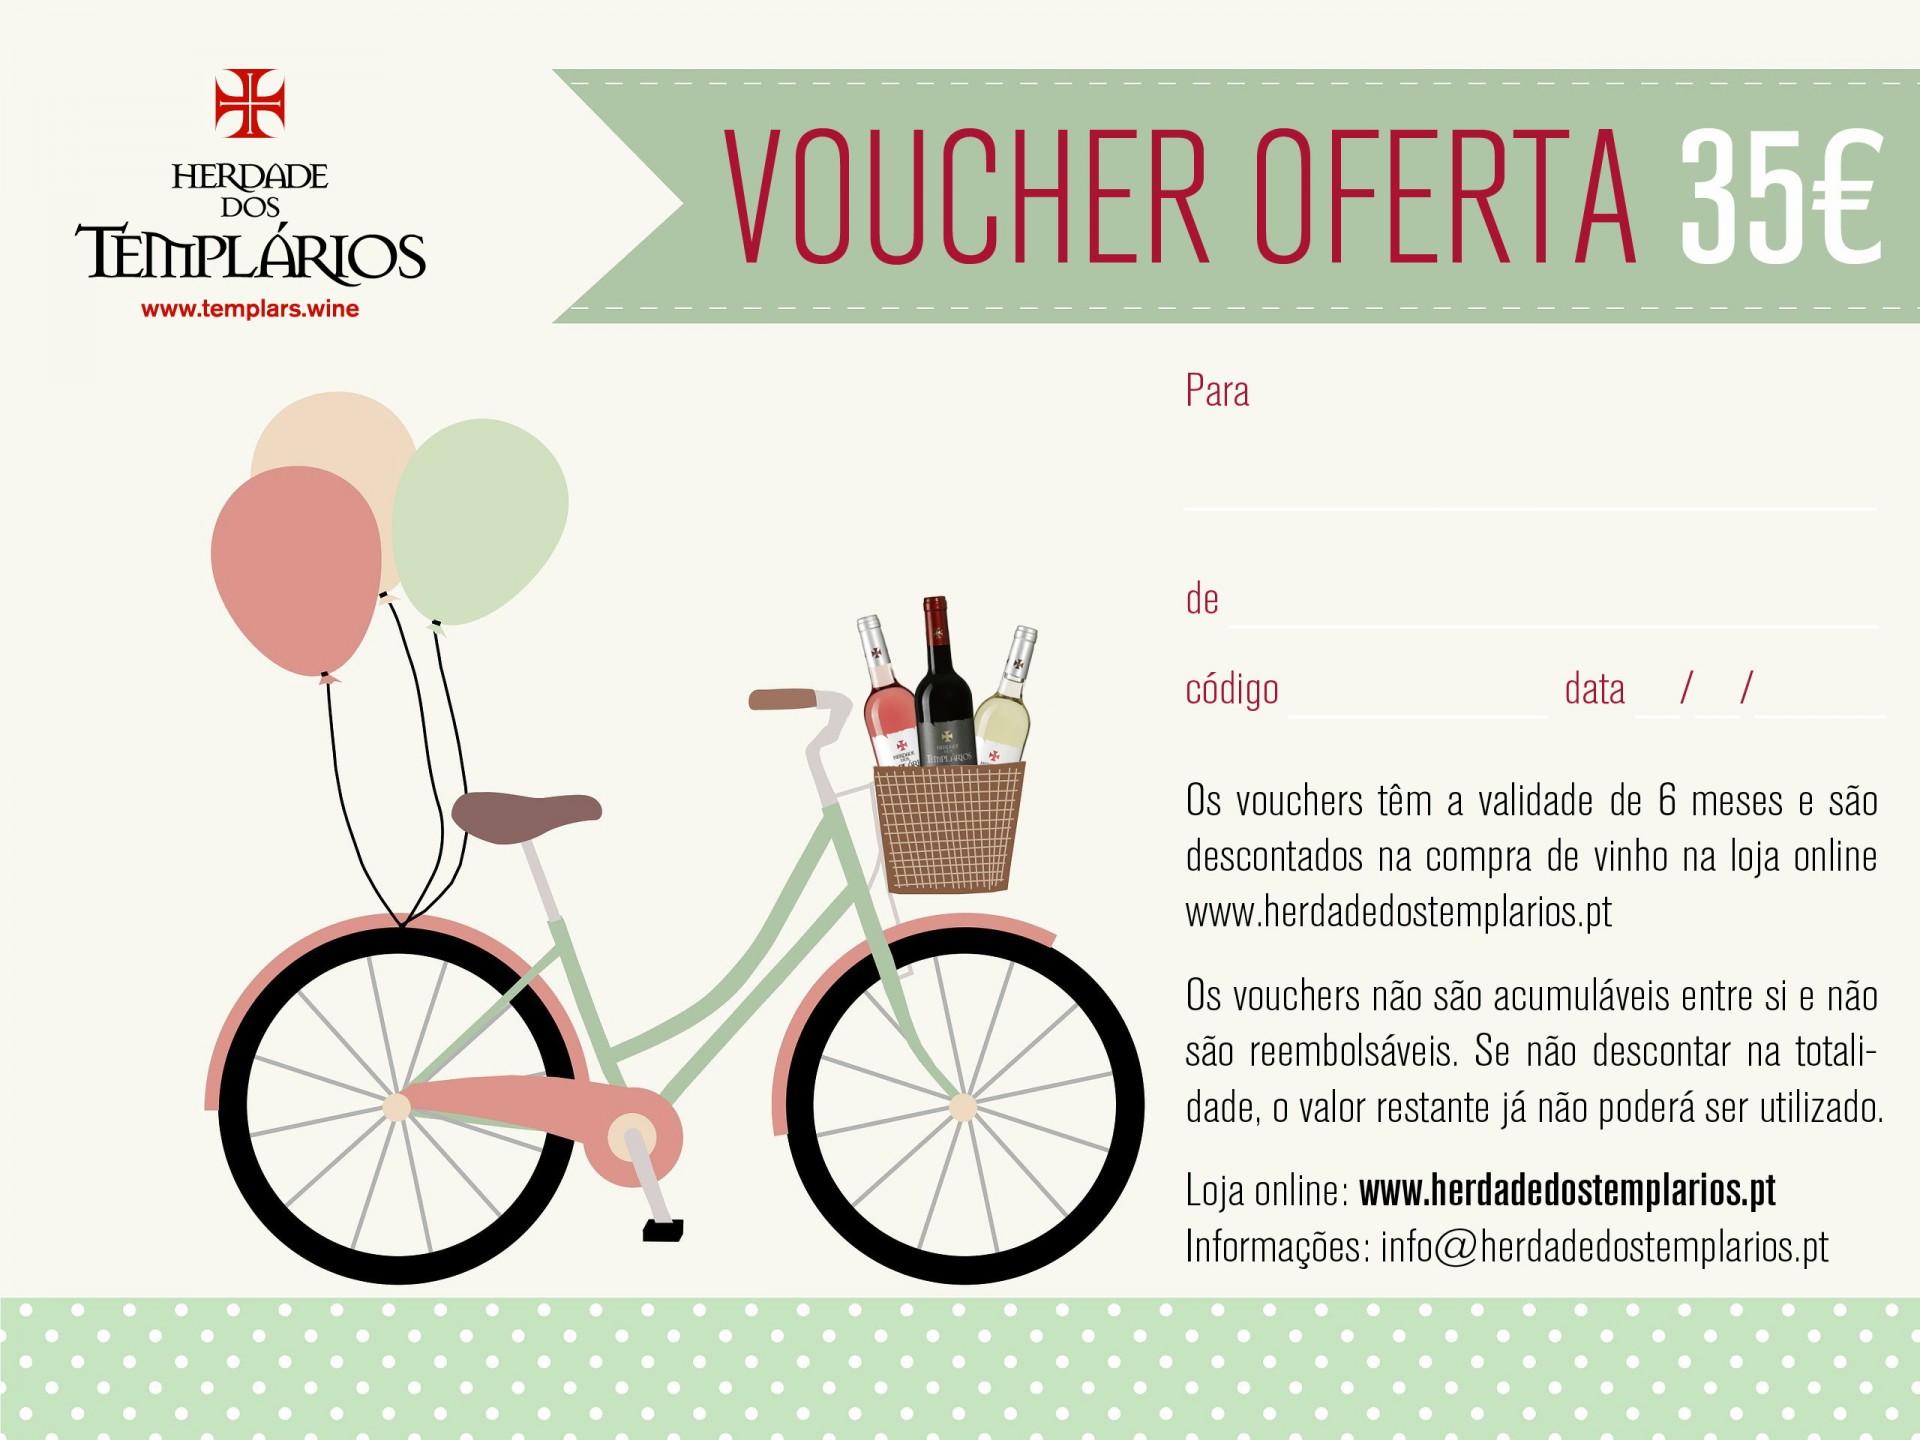 Voucher de Oferta - 35€